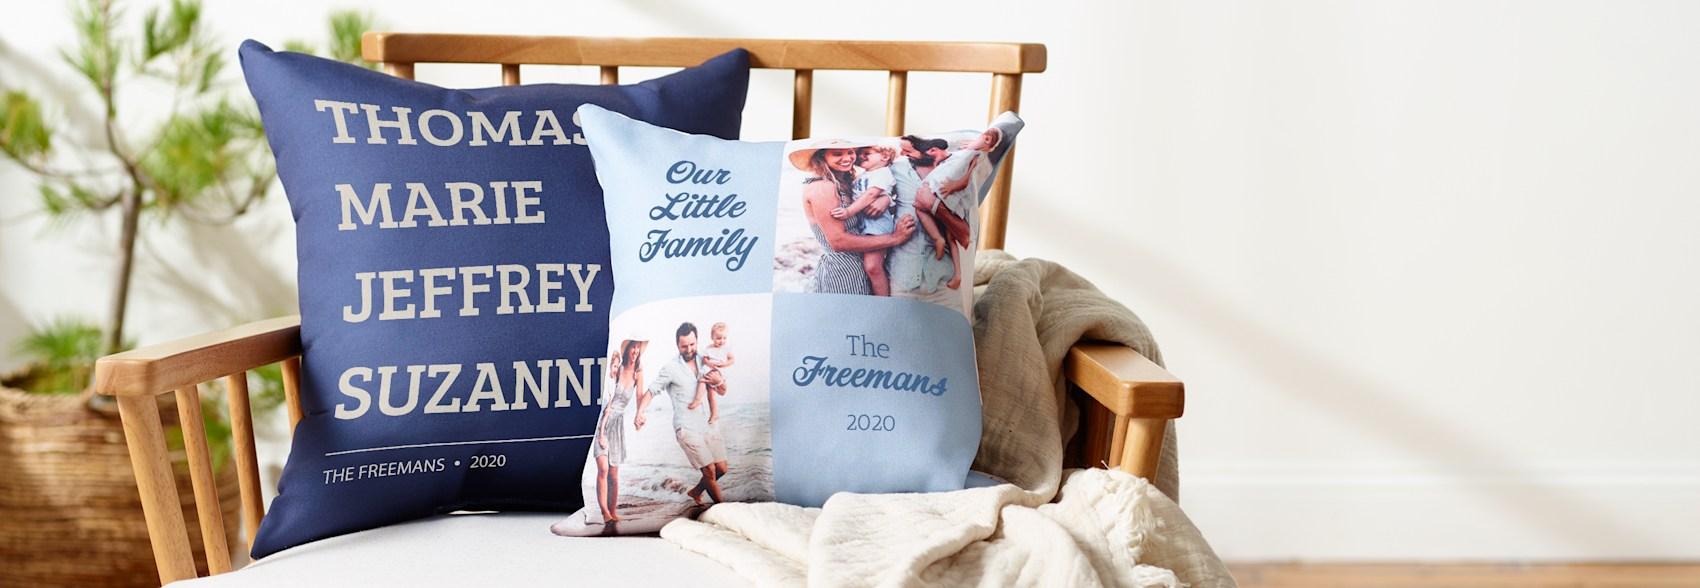 custom cushions with photos and text